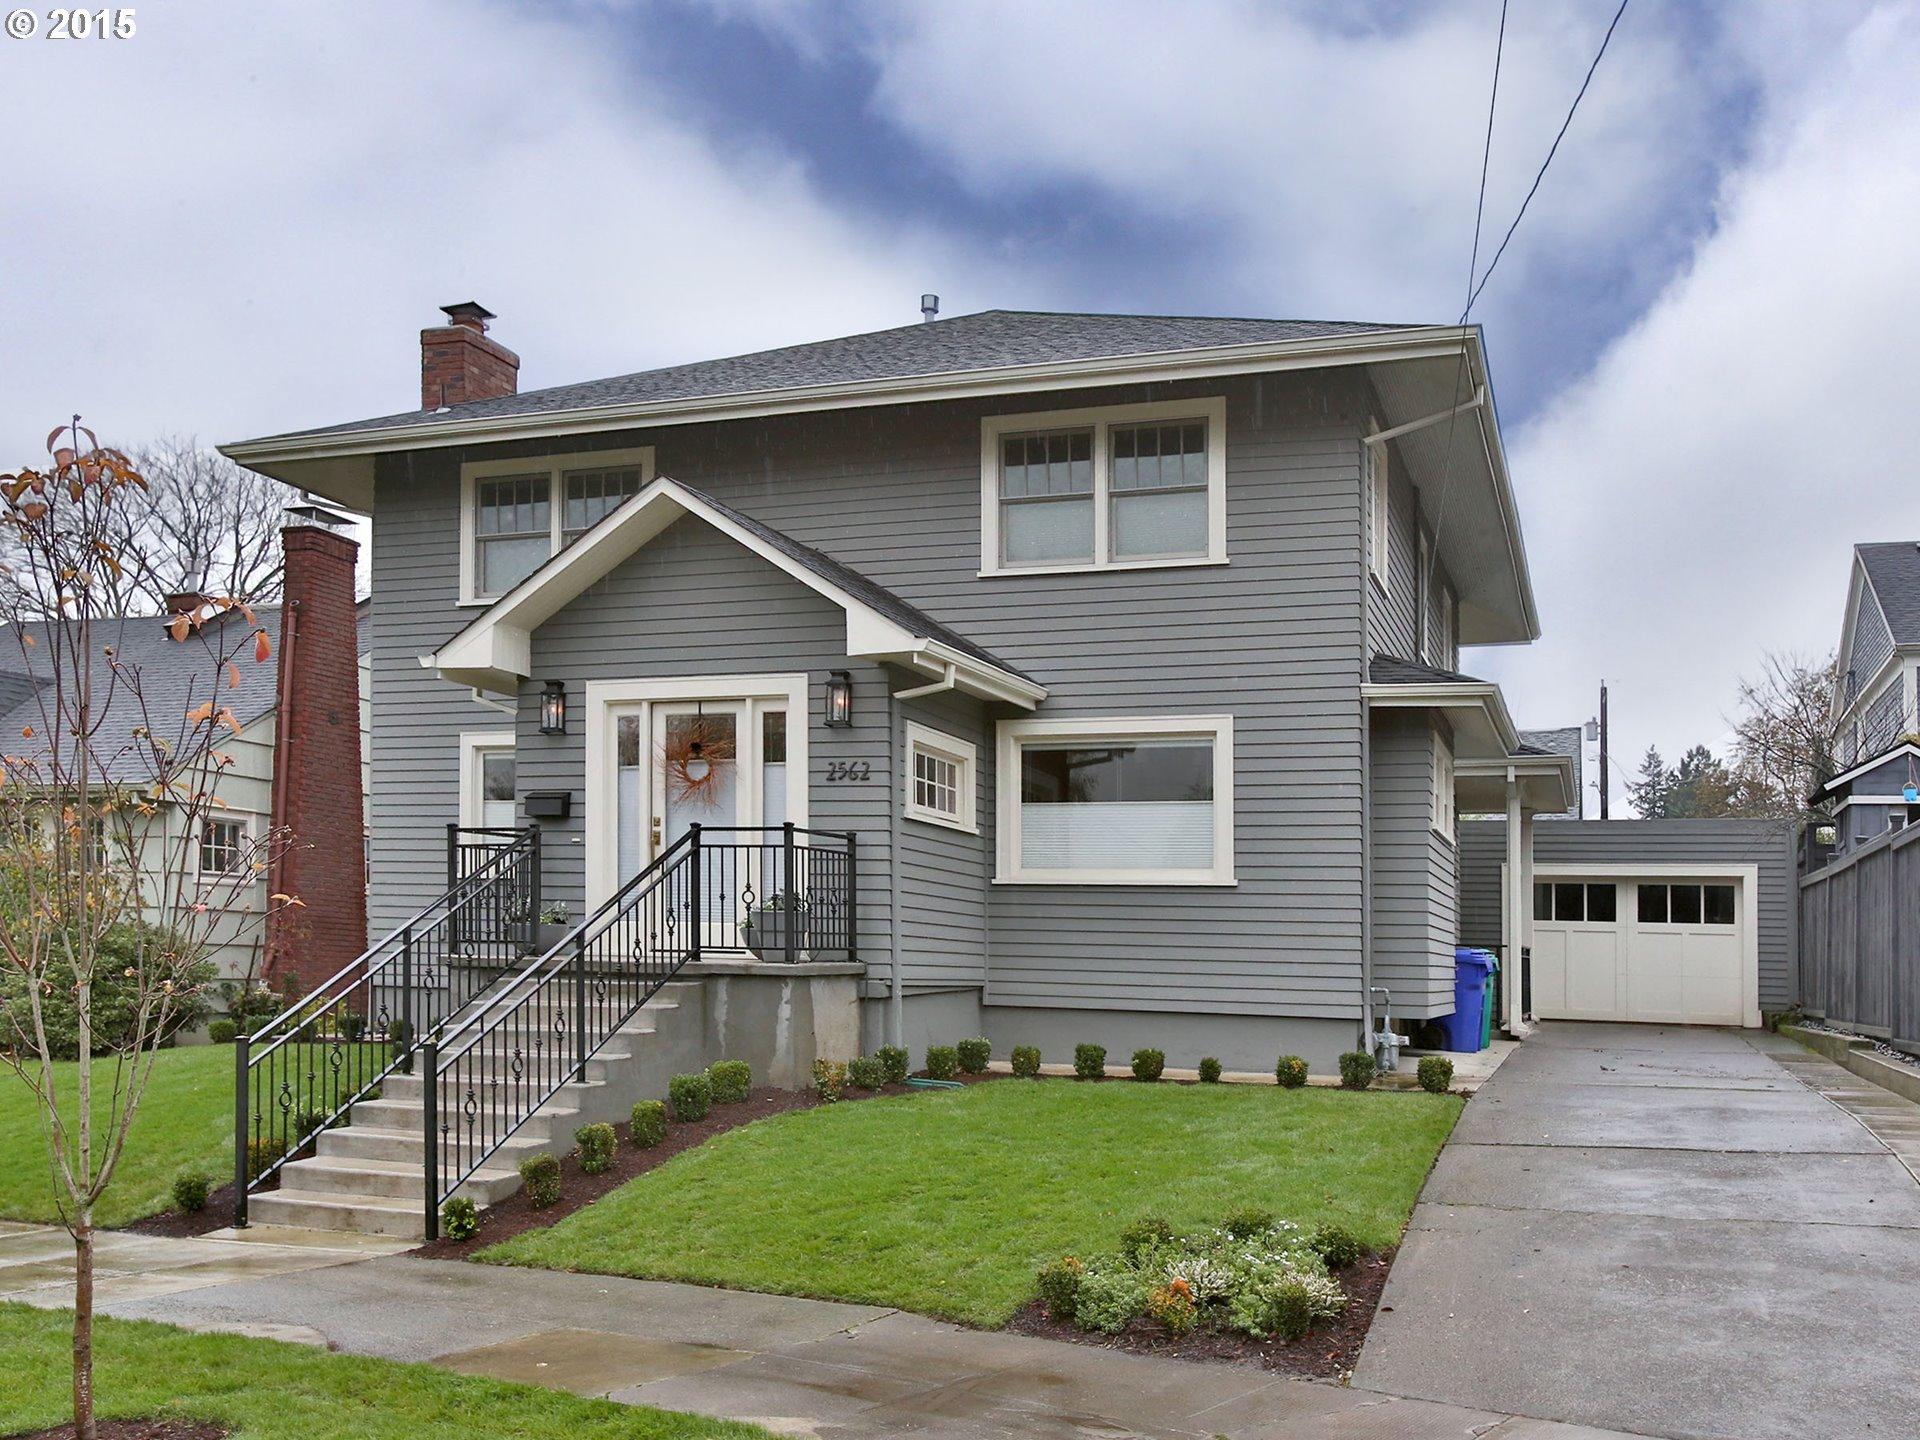 2562 NE 31ST AVE, Portland OR 97212